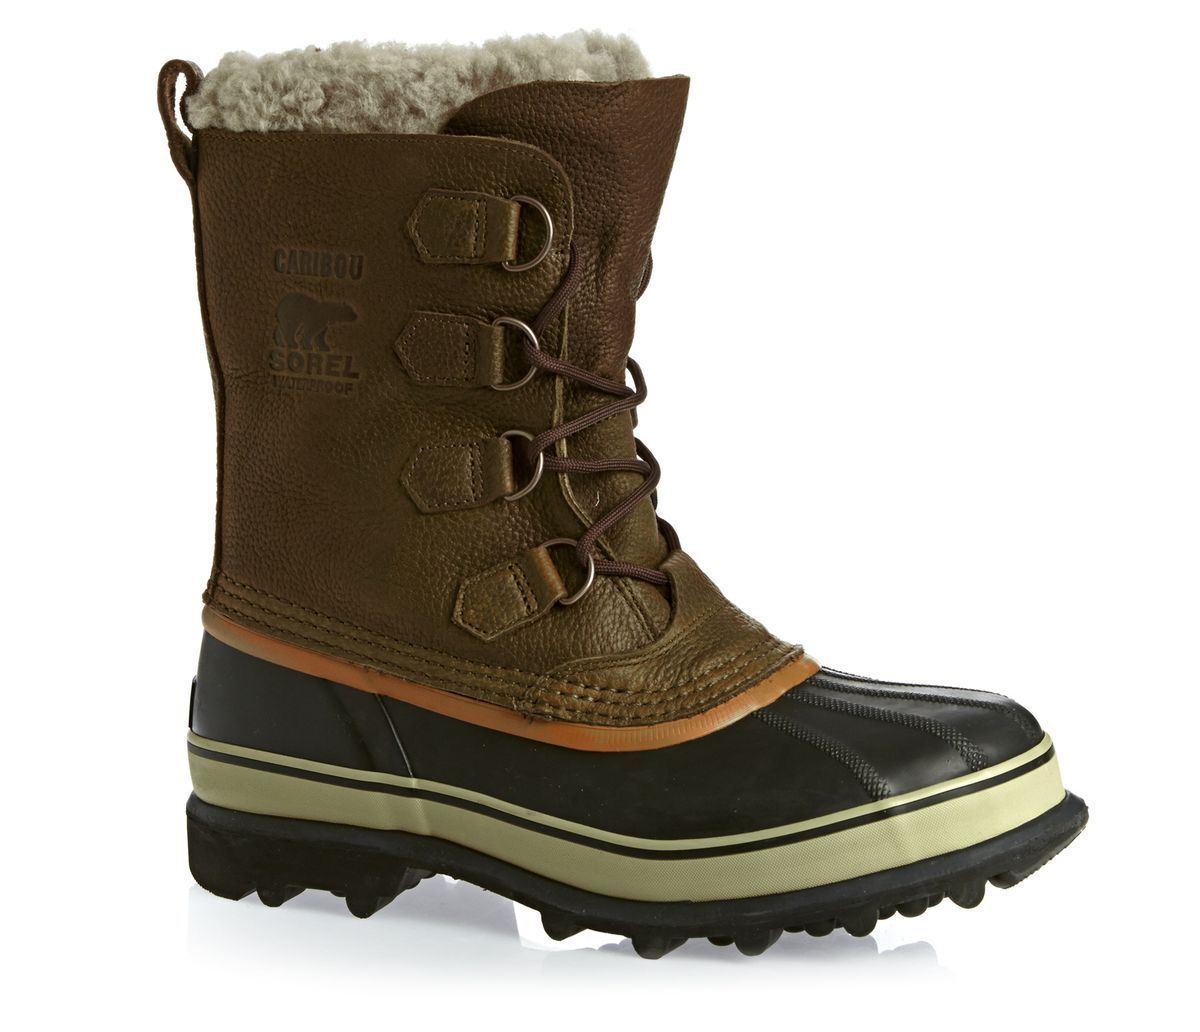 NWT SOREL Men's Caribou Waterproof Leather Boot, Olive Brown/Ginger sz 9 (42-EU)